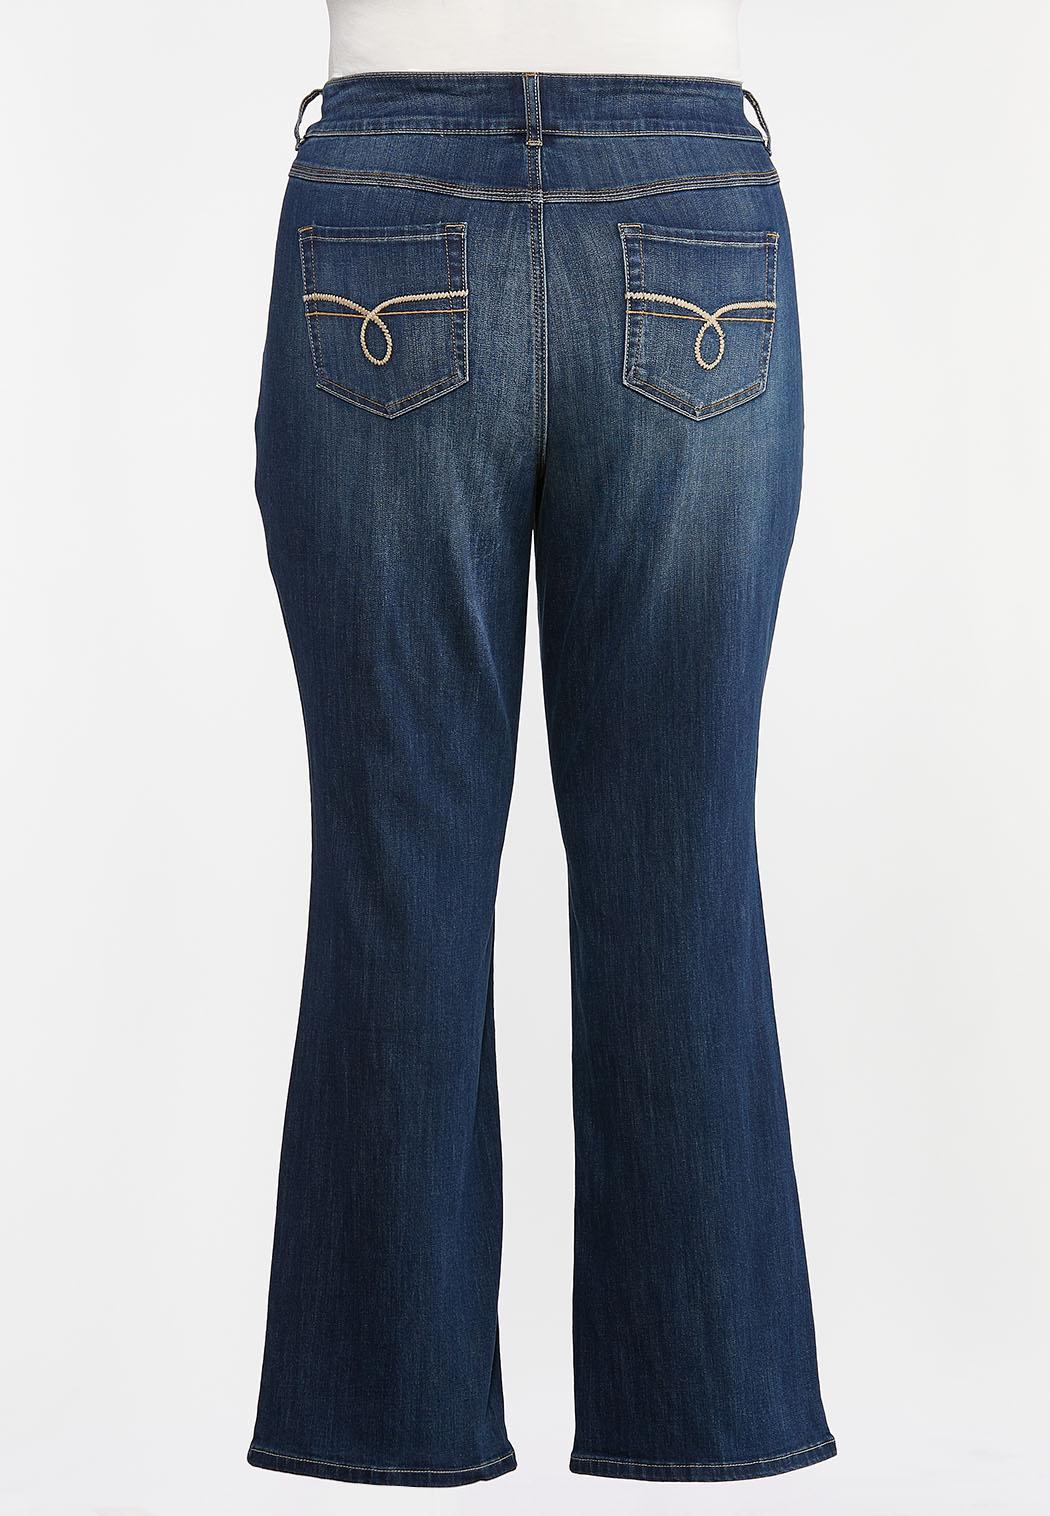 Plus Petite High-Rise Bootcut Jeans (Item #44378436)